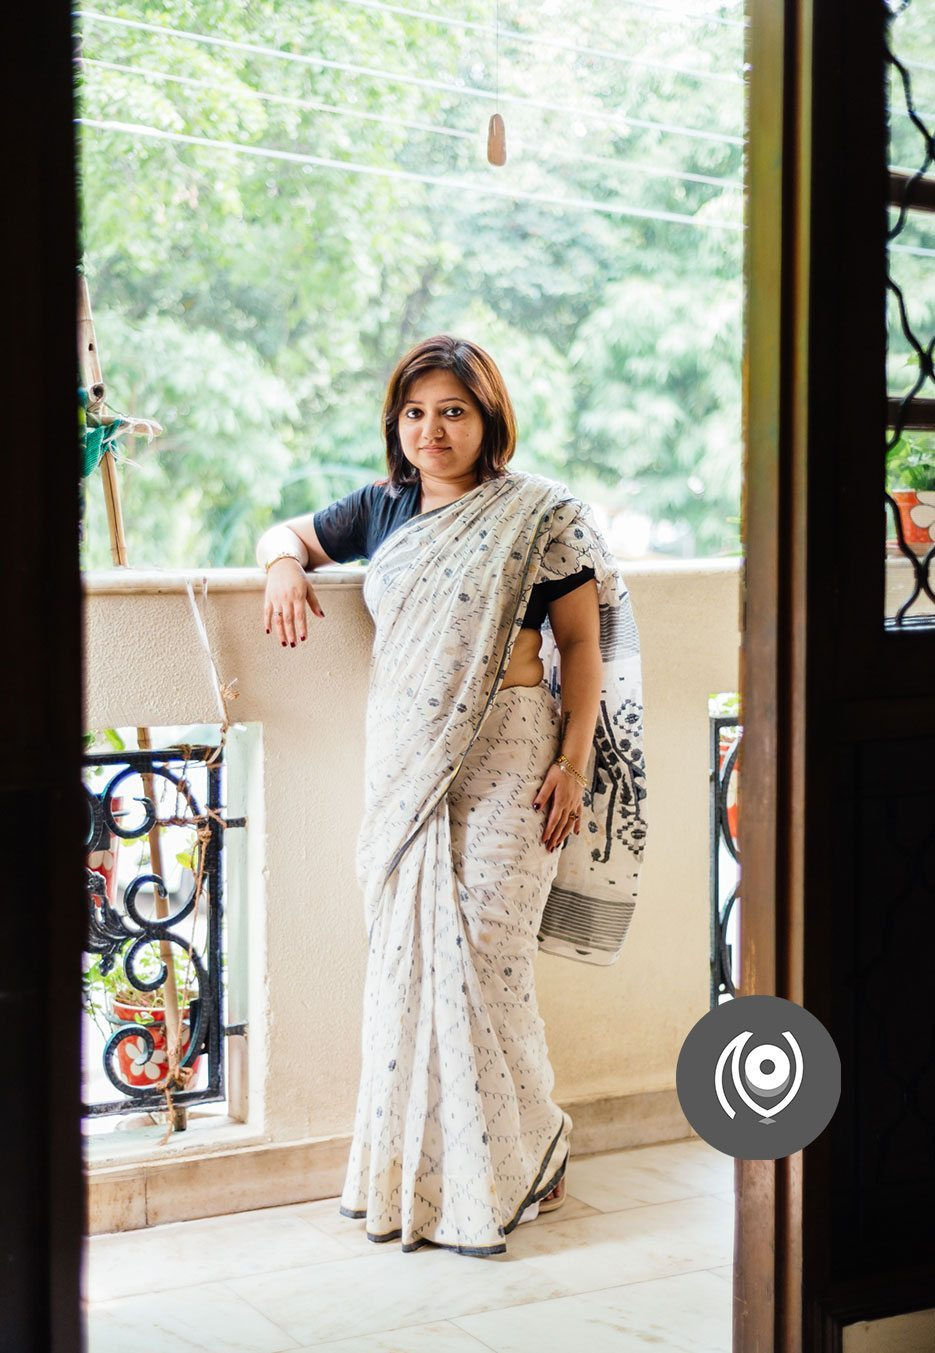 NainaCo-Cotton-Council-International-LiveInCotton-Luxury-Lifestyle-Raconteuse-Photographer-Storyteller-Jhelum-Biswas-Bose